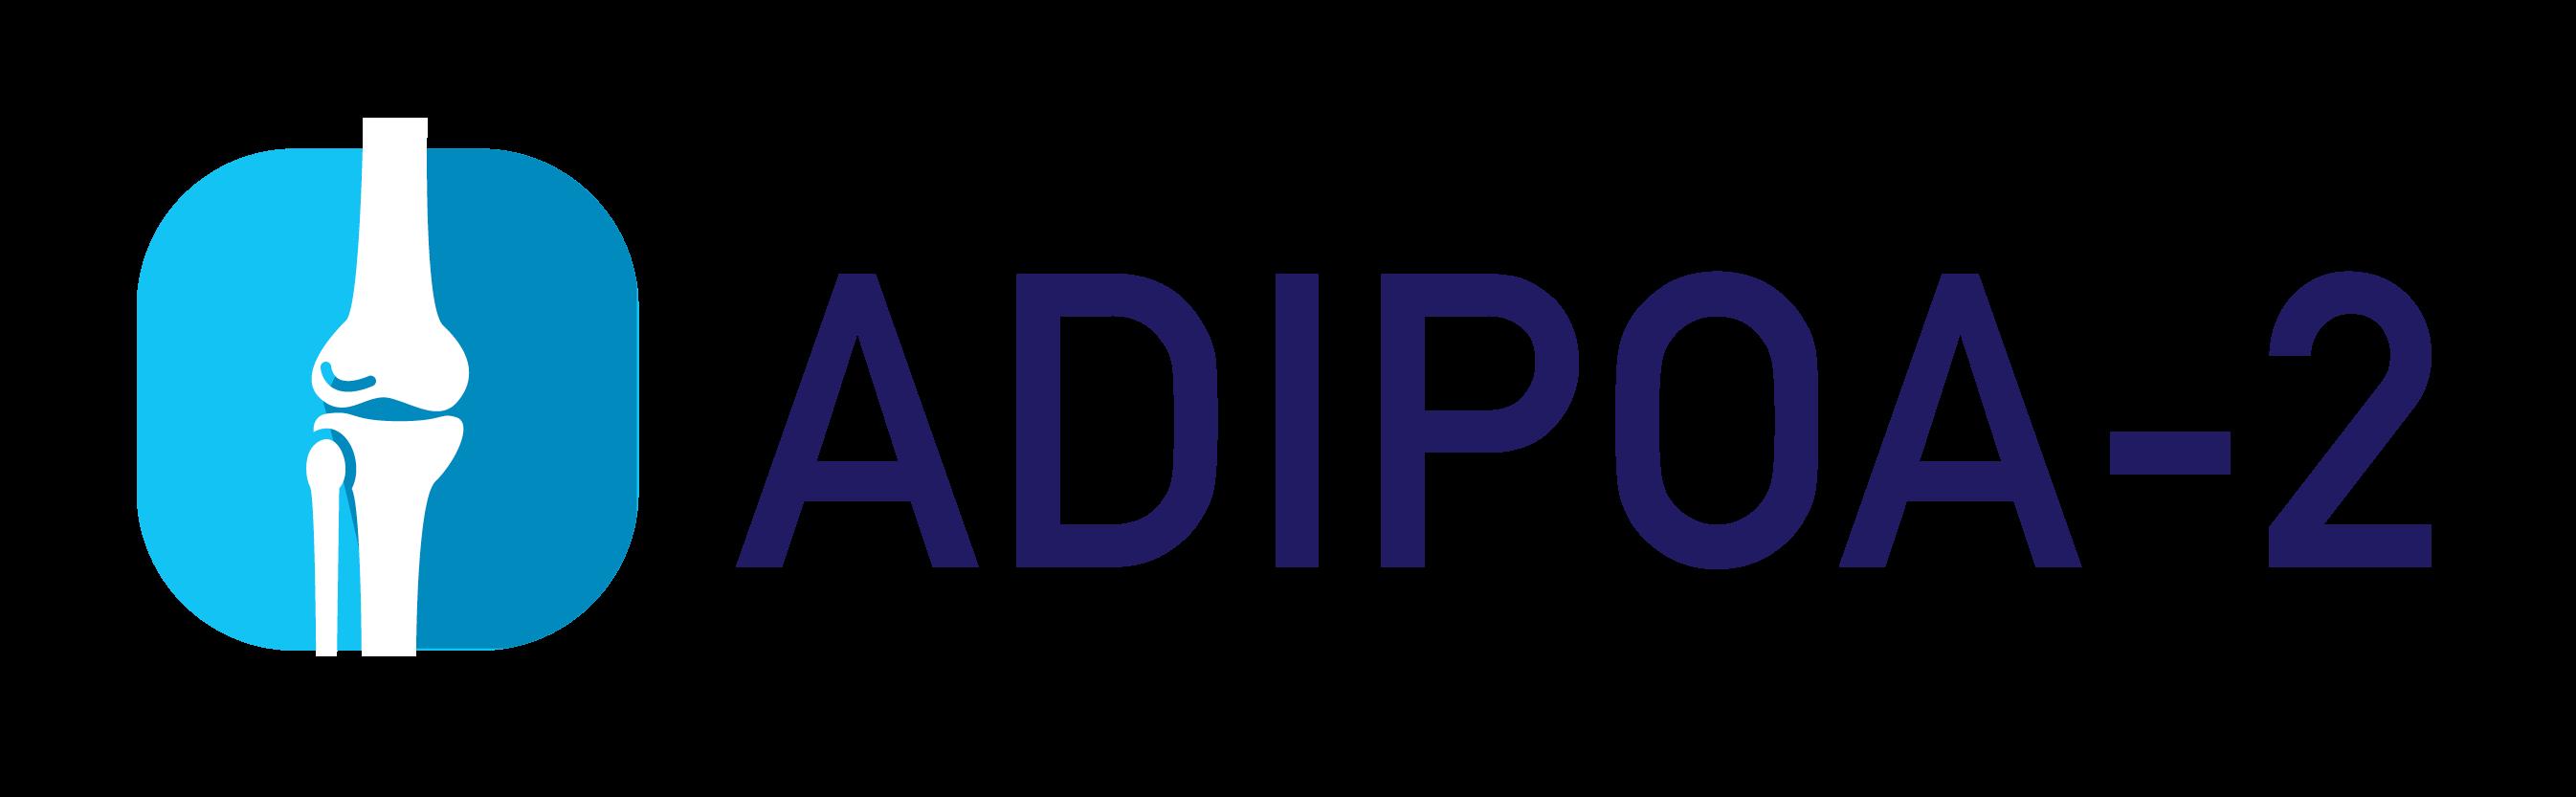 Adipoa-2